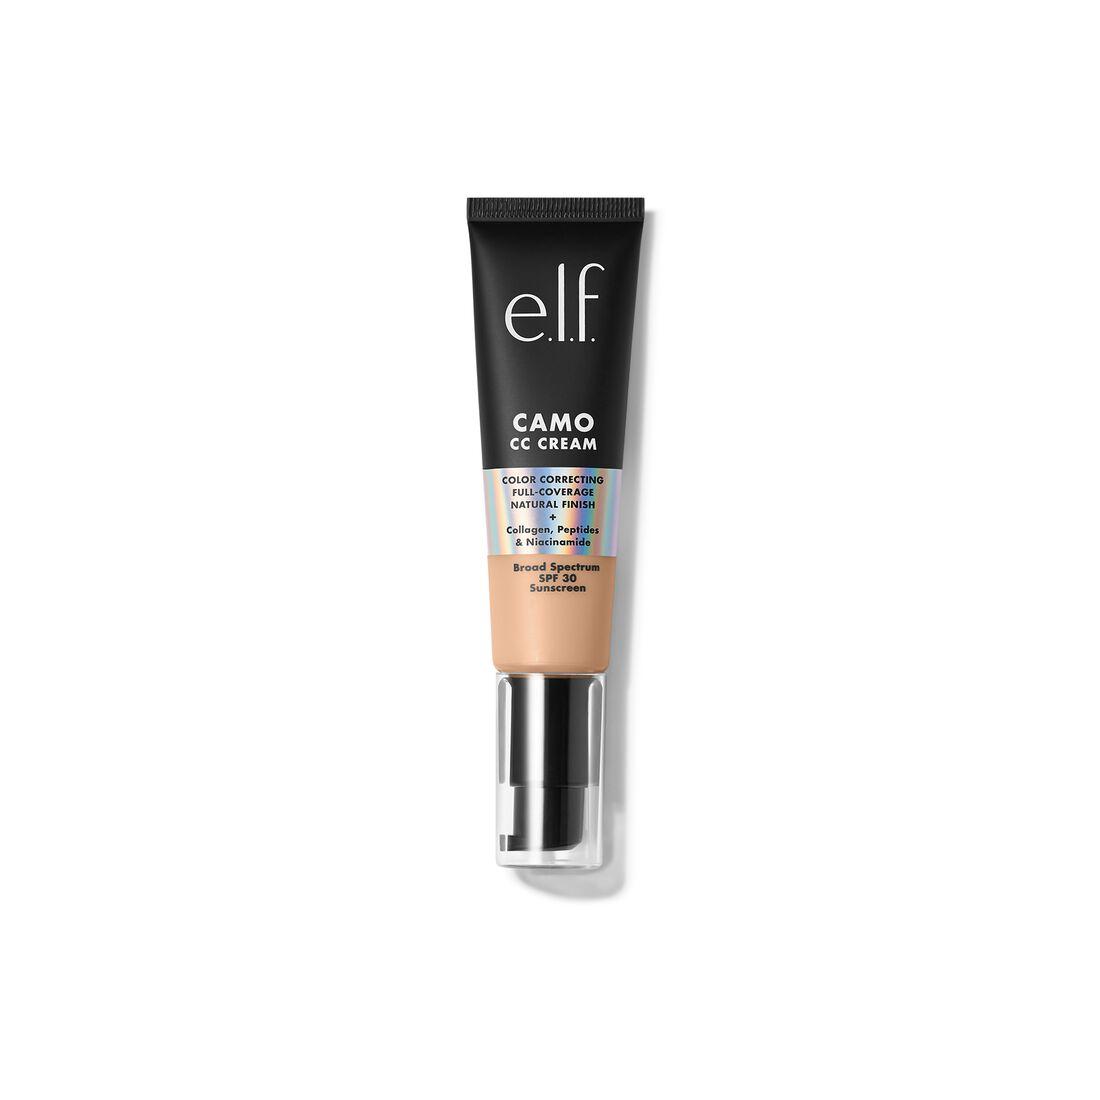 ELF Camo CC Cream SPF30